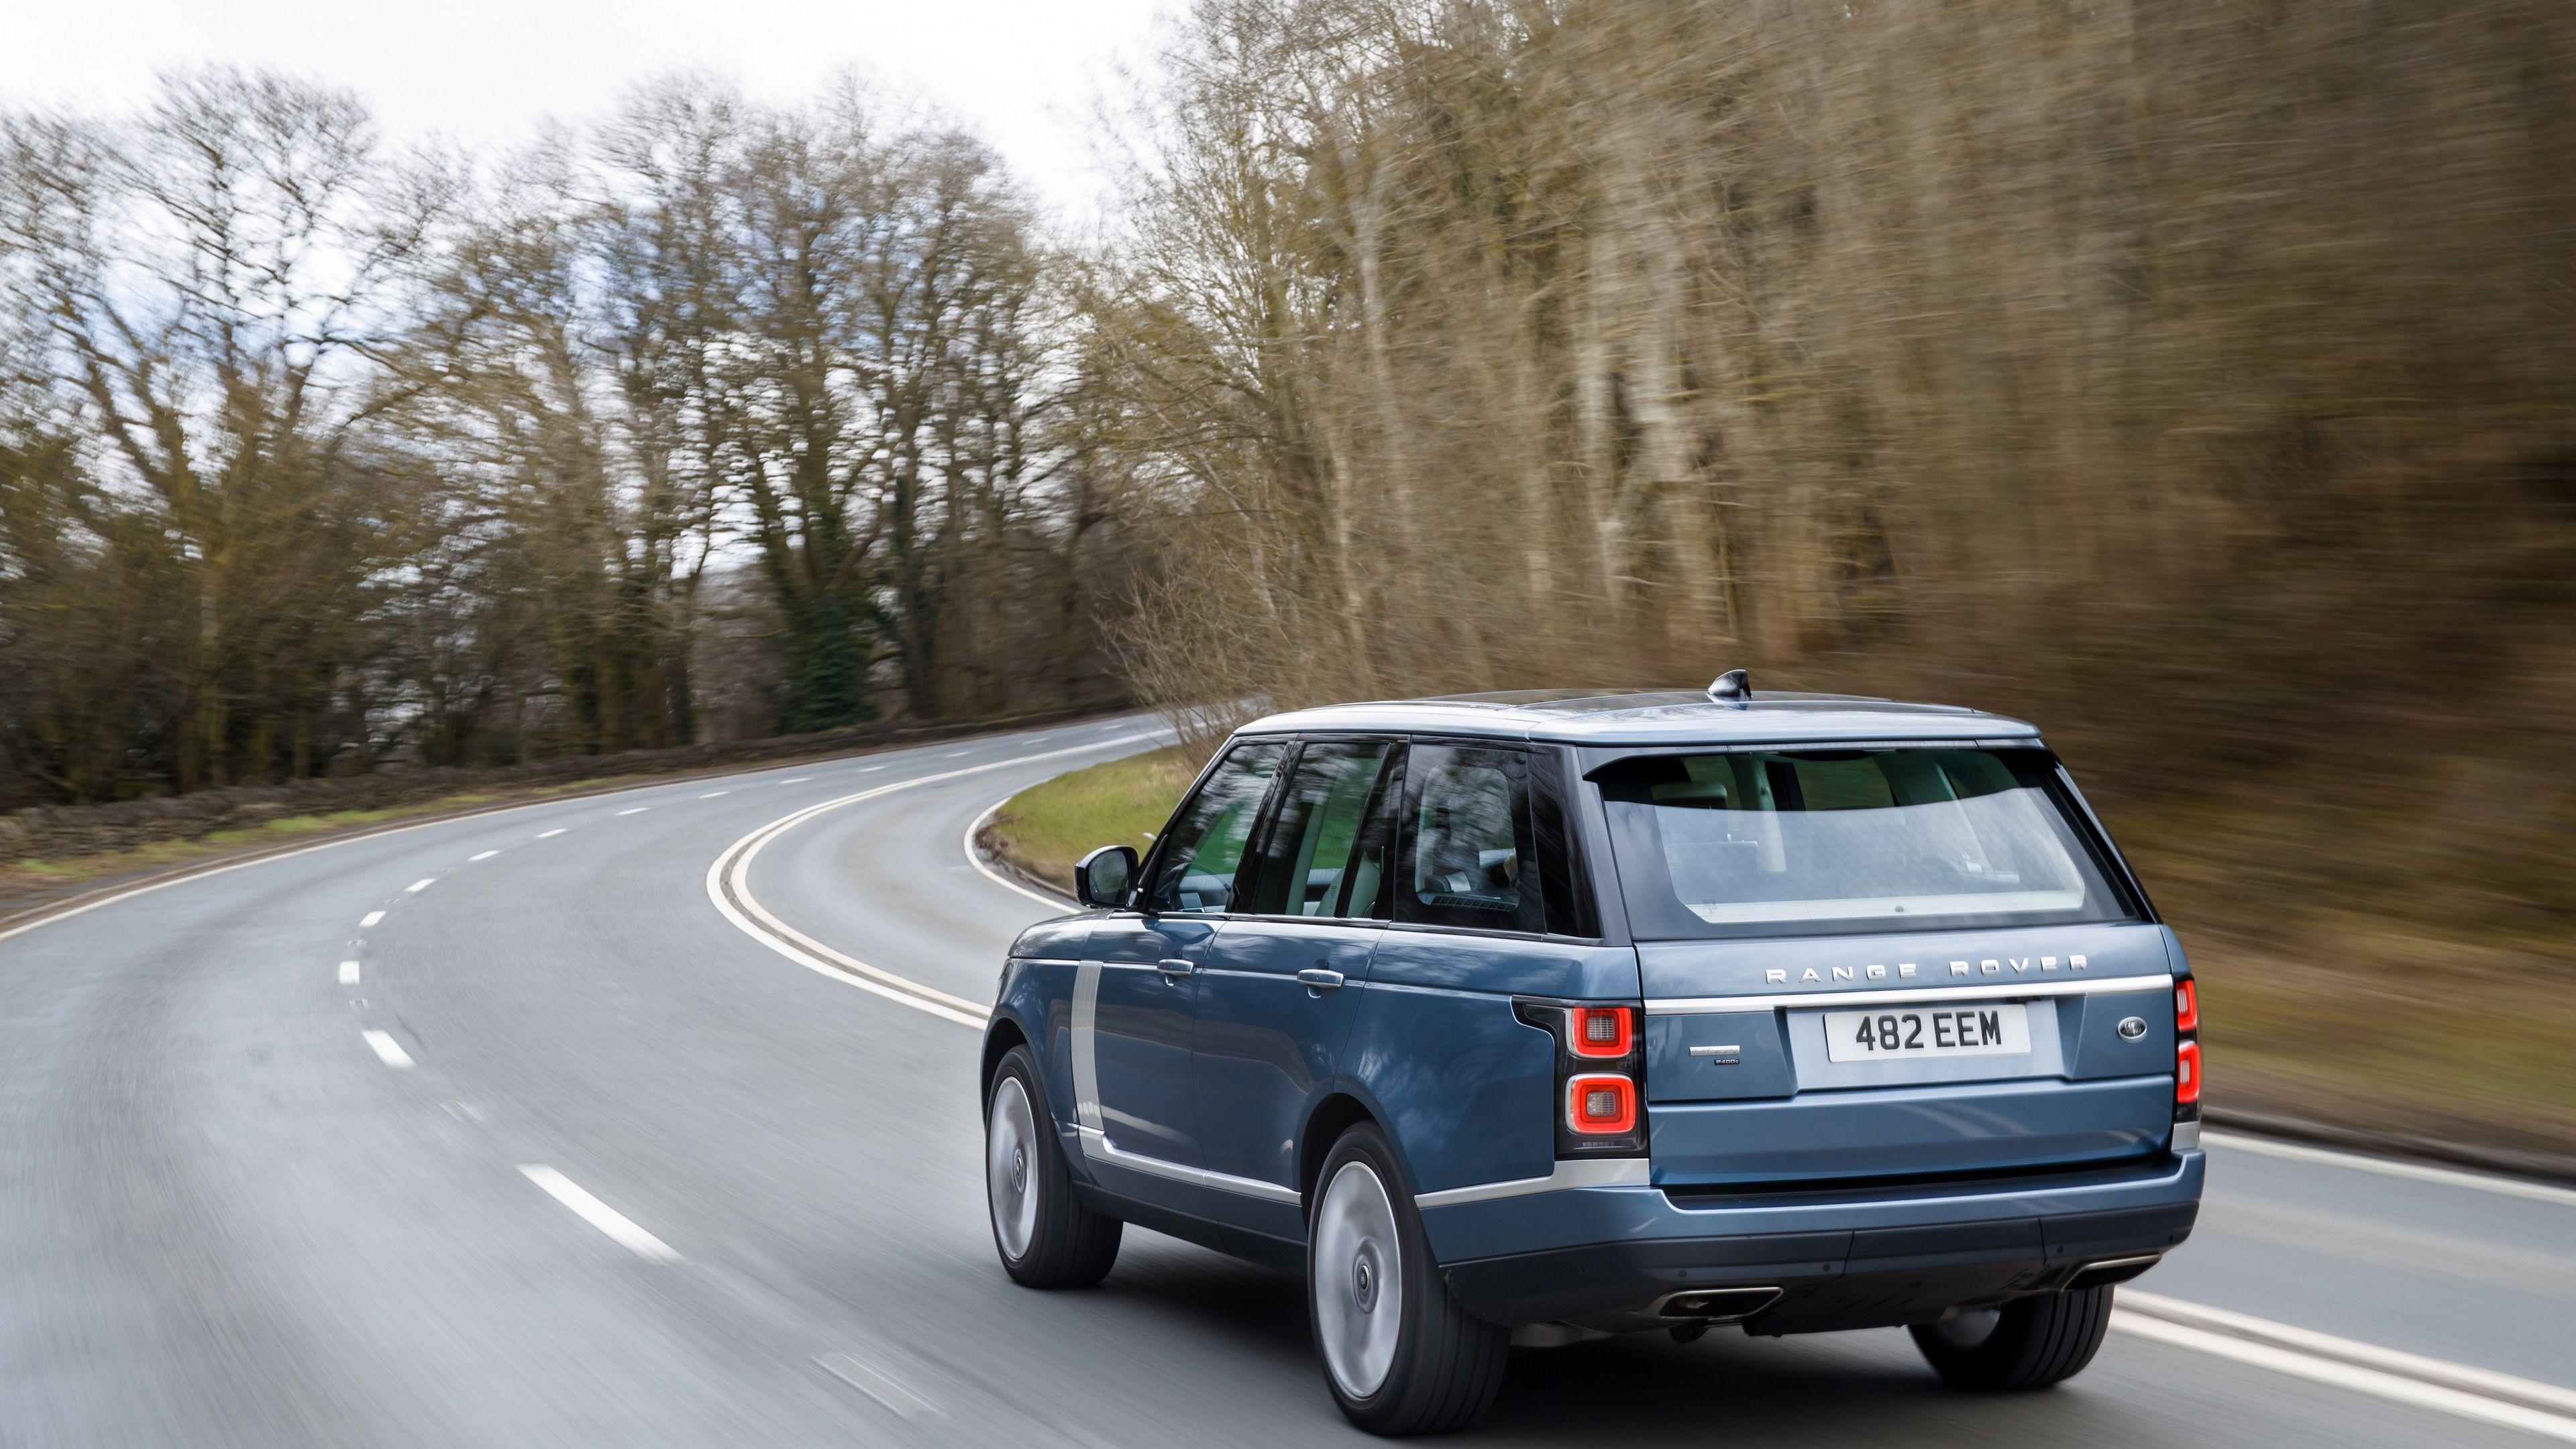 2018 Range Rover Autobiography 4k Range Rover Wallpapers Range Rover Svautobiography Wallpapers Hd Wallpapers 4k Range Rover Range Rover 2018 Car Wallpapers